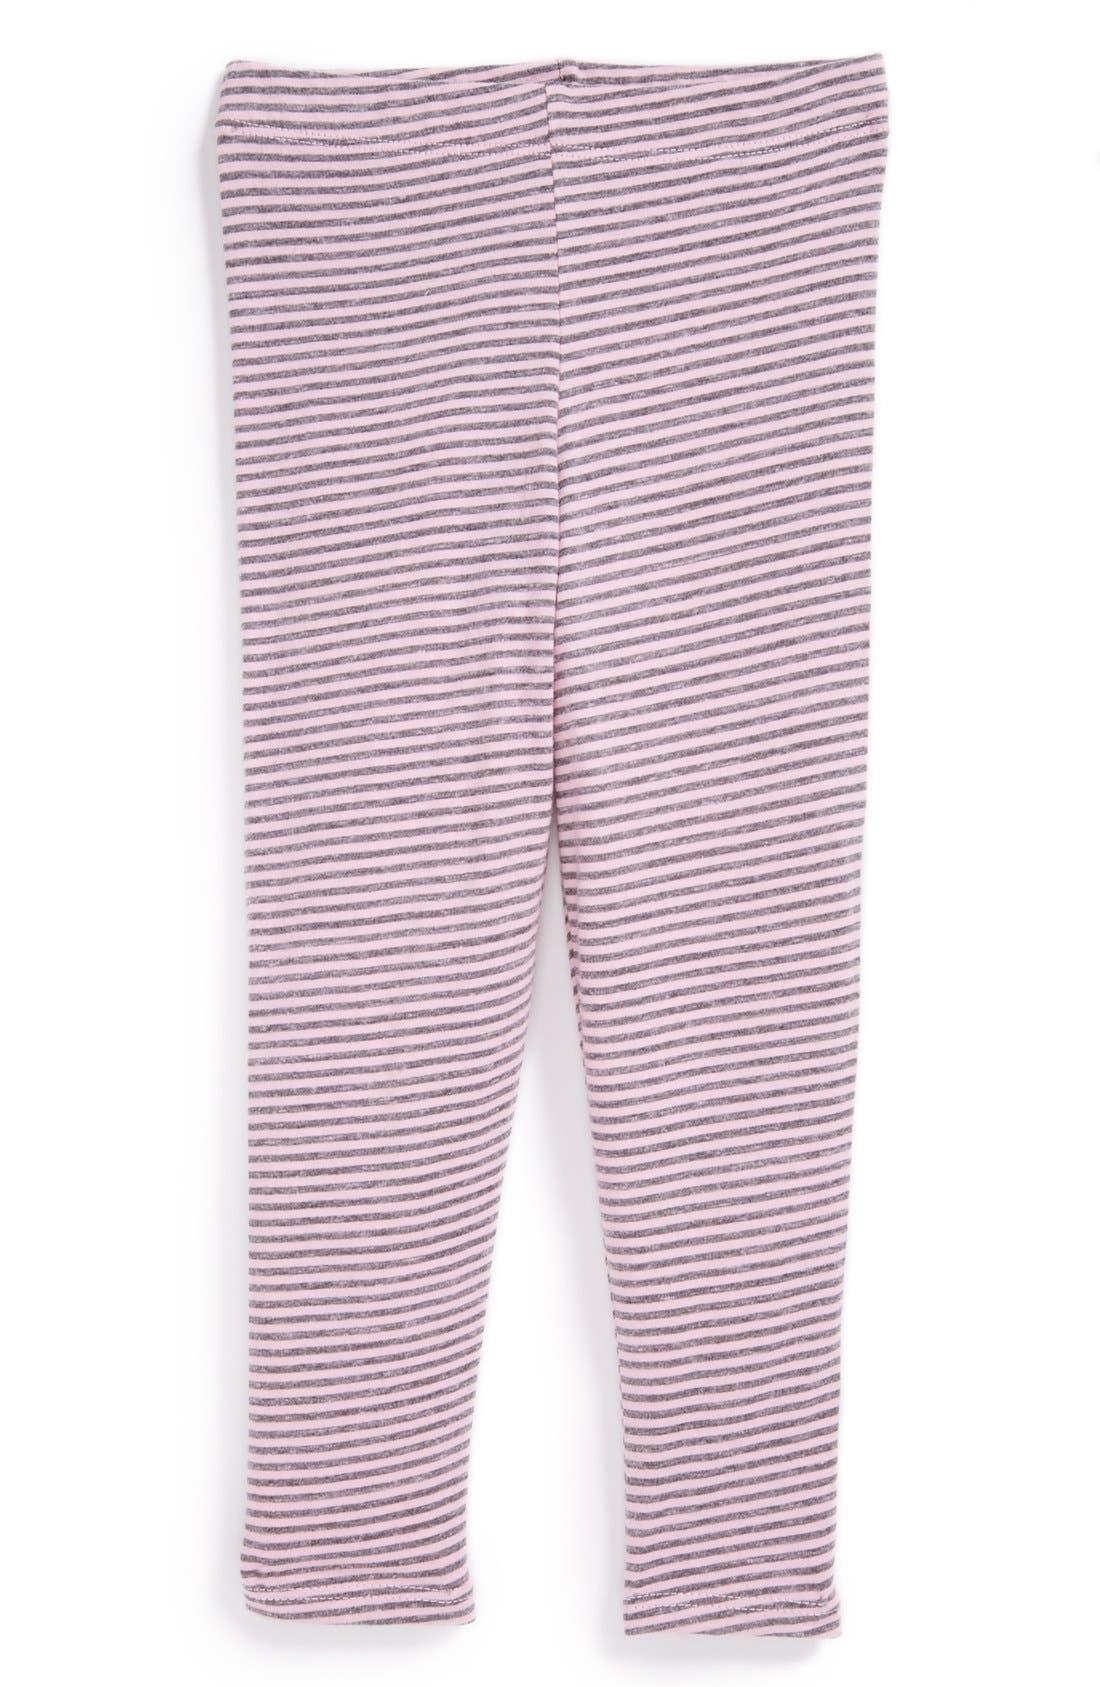 Alternate Image 1 Selected - Red Wagon Baby Stripe Leggings (Toddler Girls)